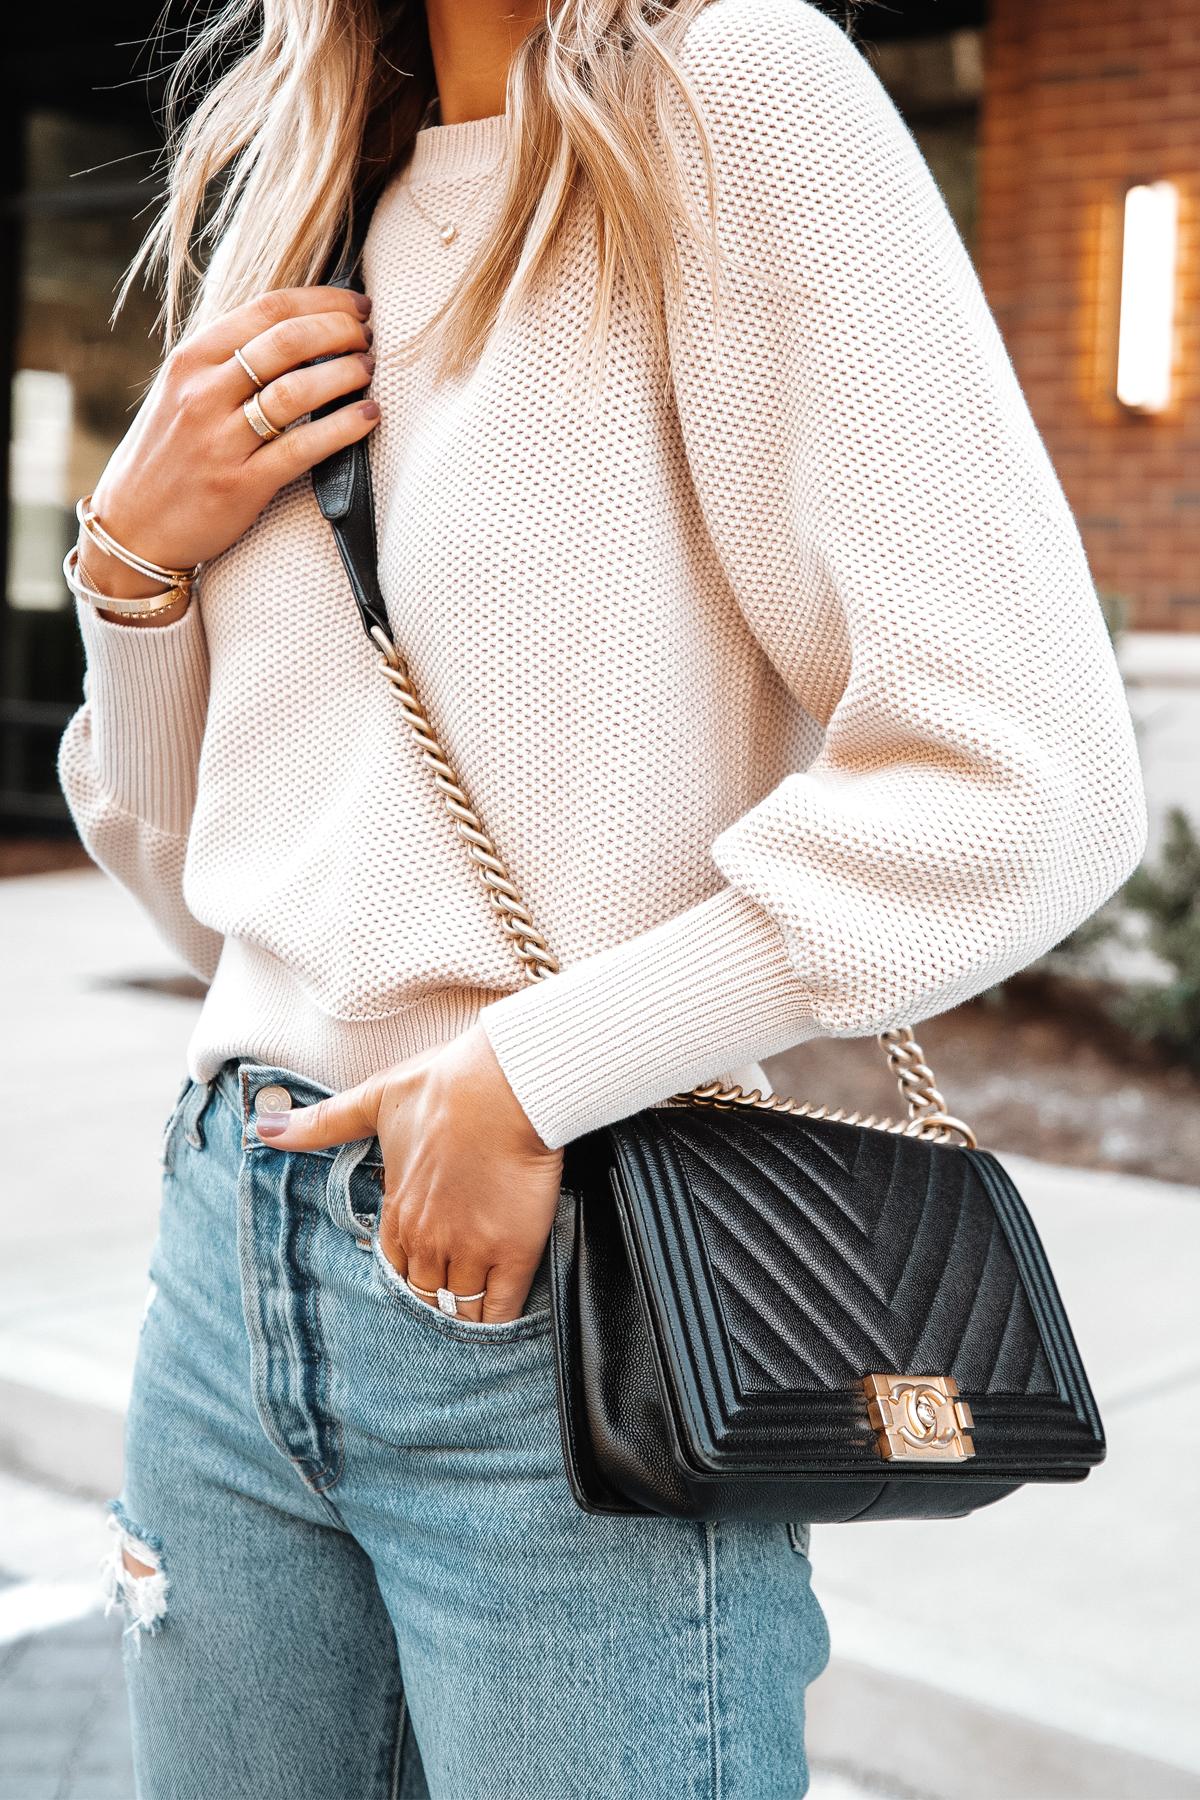 Fashion Jackson Wearing Ann Taylor Beige Knit Sweater Levis Ripped Jeans Chanel Black Boy Bag 2